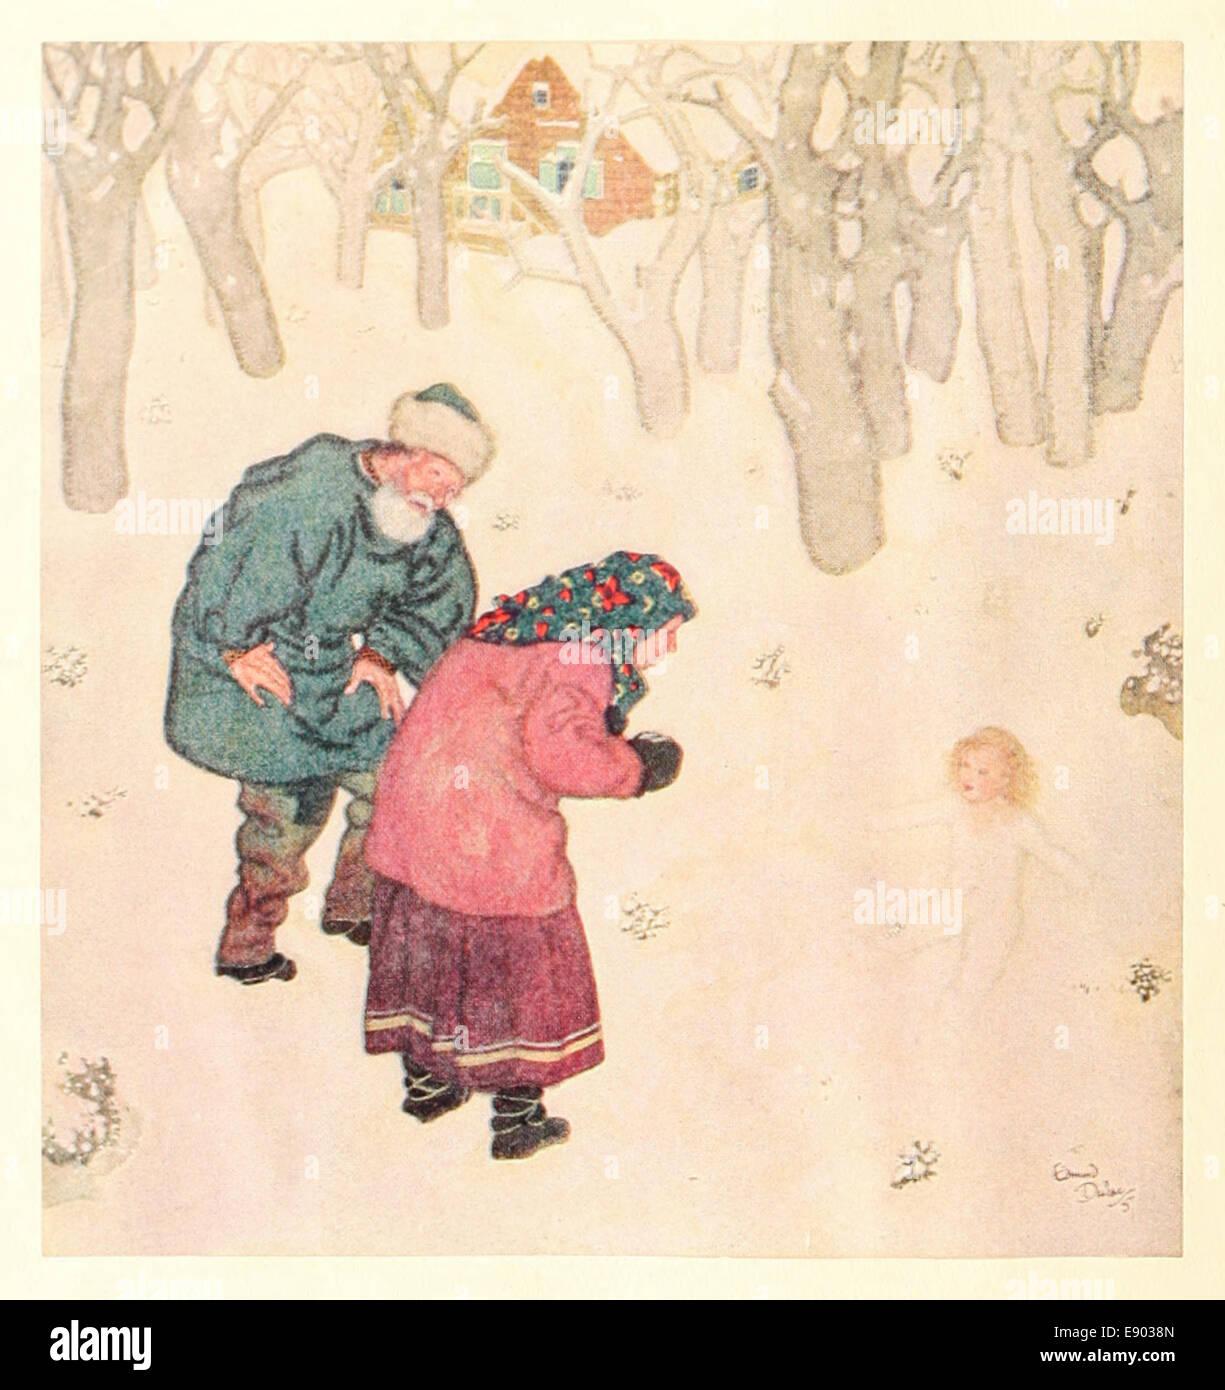 Snegurochka, the Snow Maiden, Russian fairy tale. Edmund Dulac (1882-1953) illustration. See description for more Stock Photo